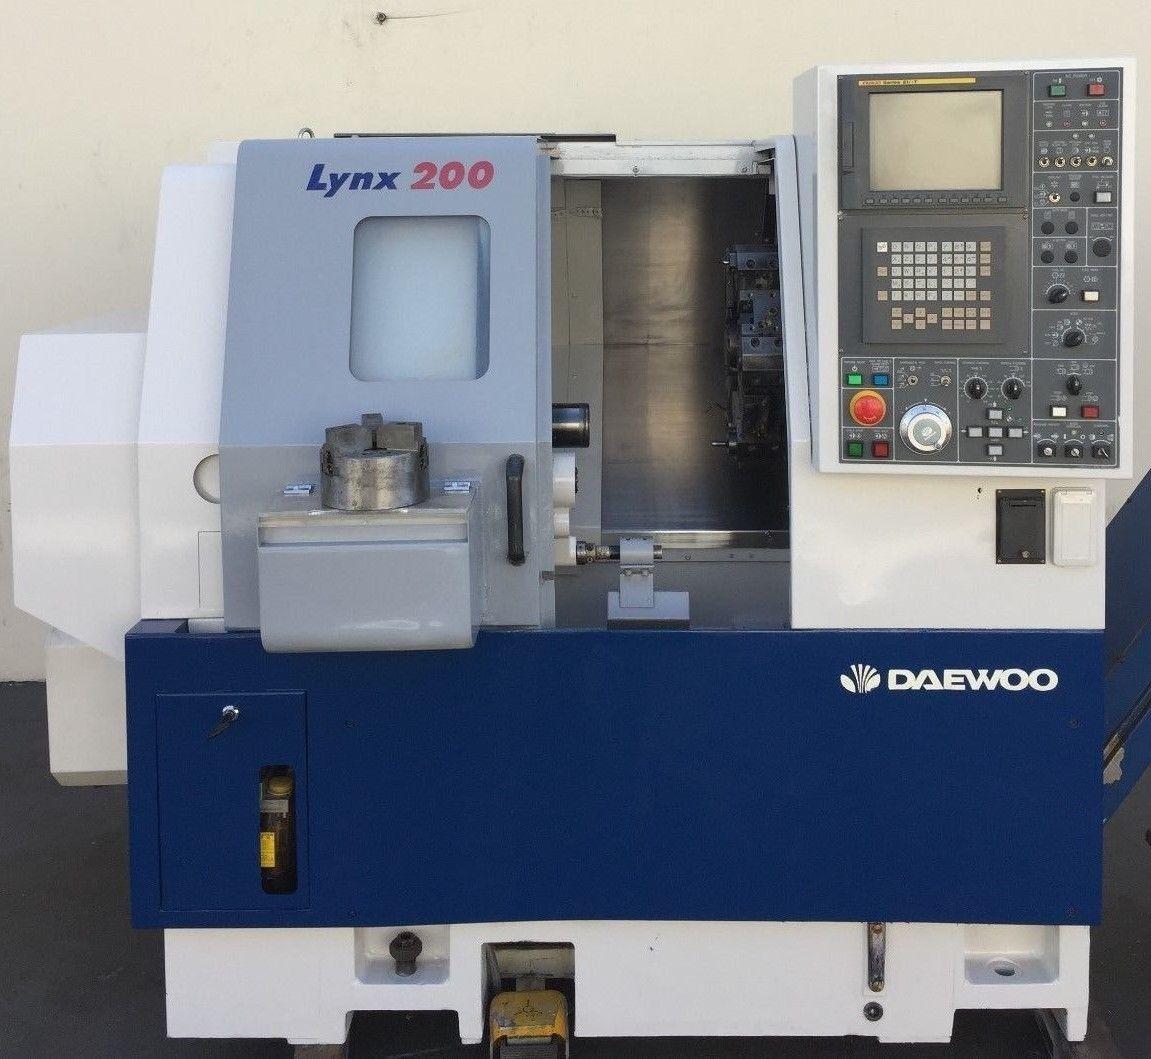 Daewoo Lynx 200 A CNC Turning Center - MachineStation